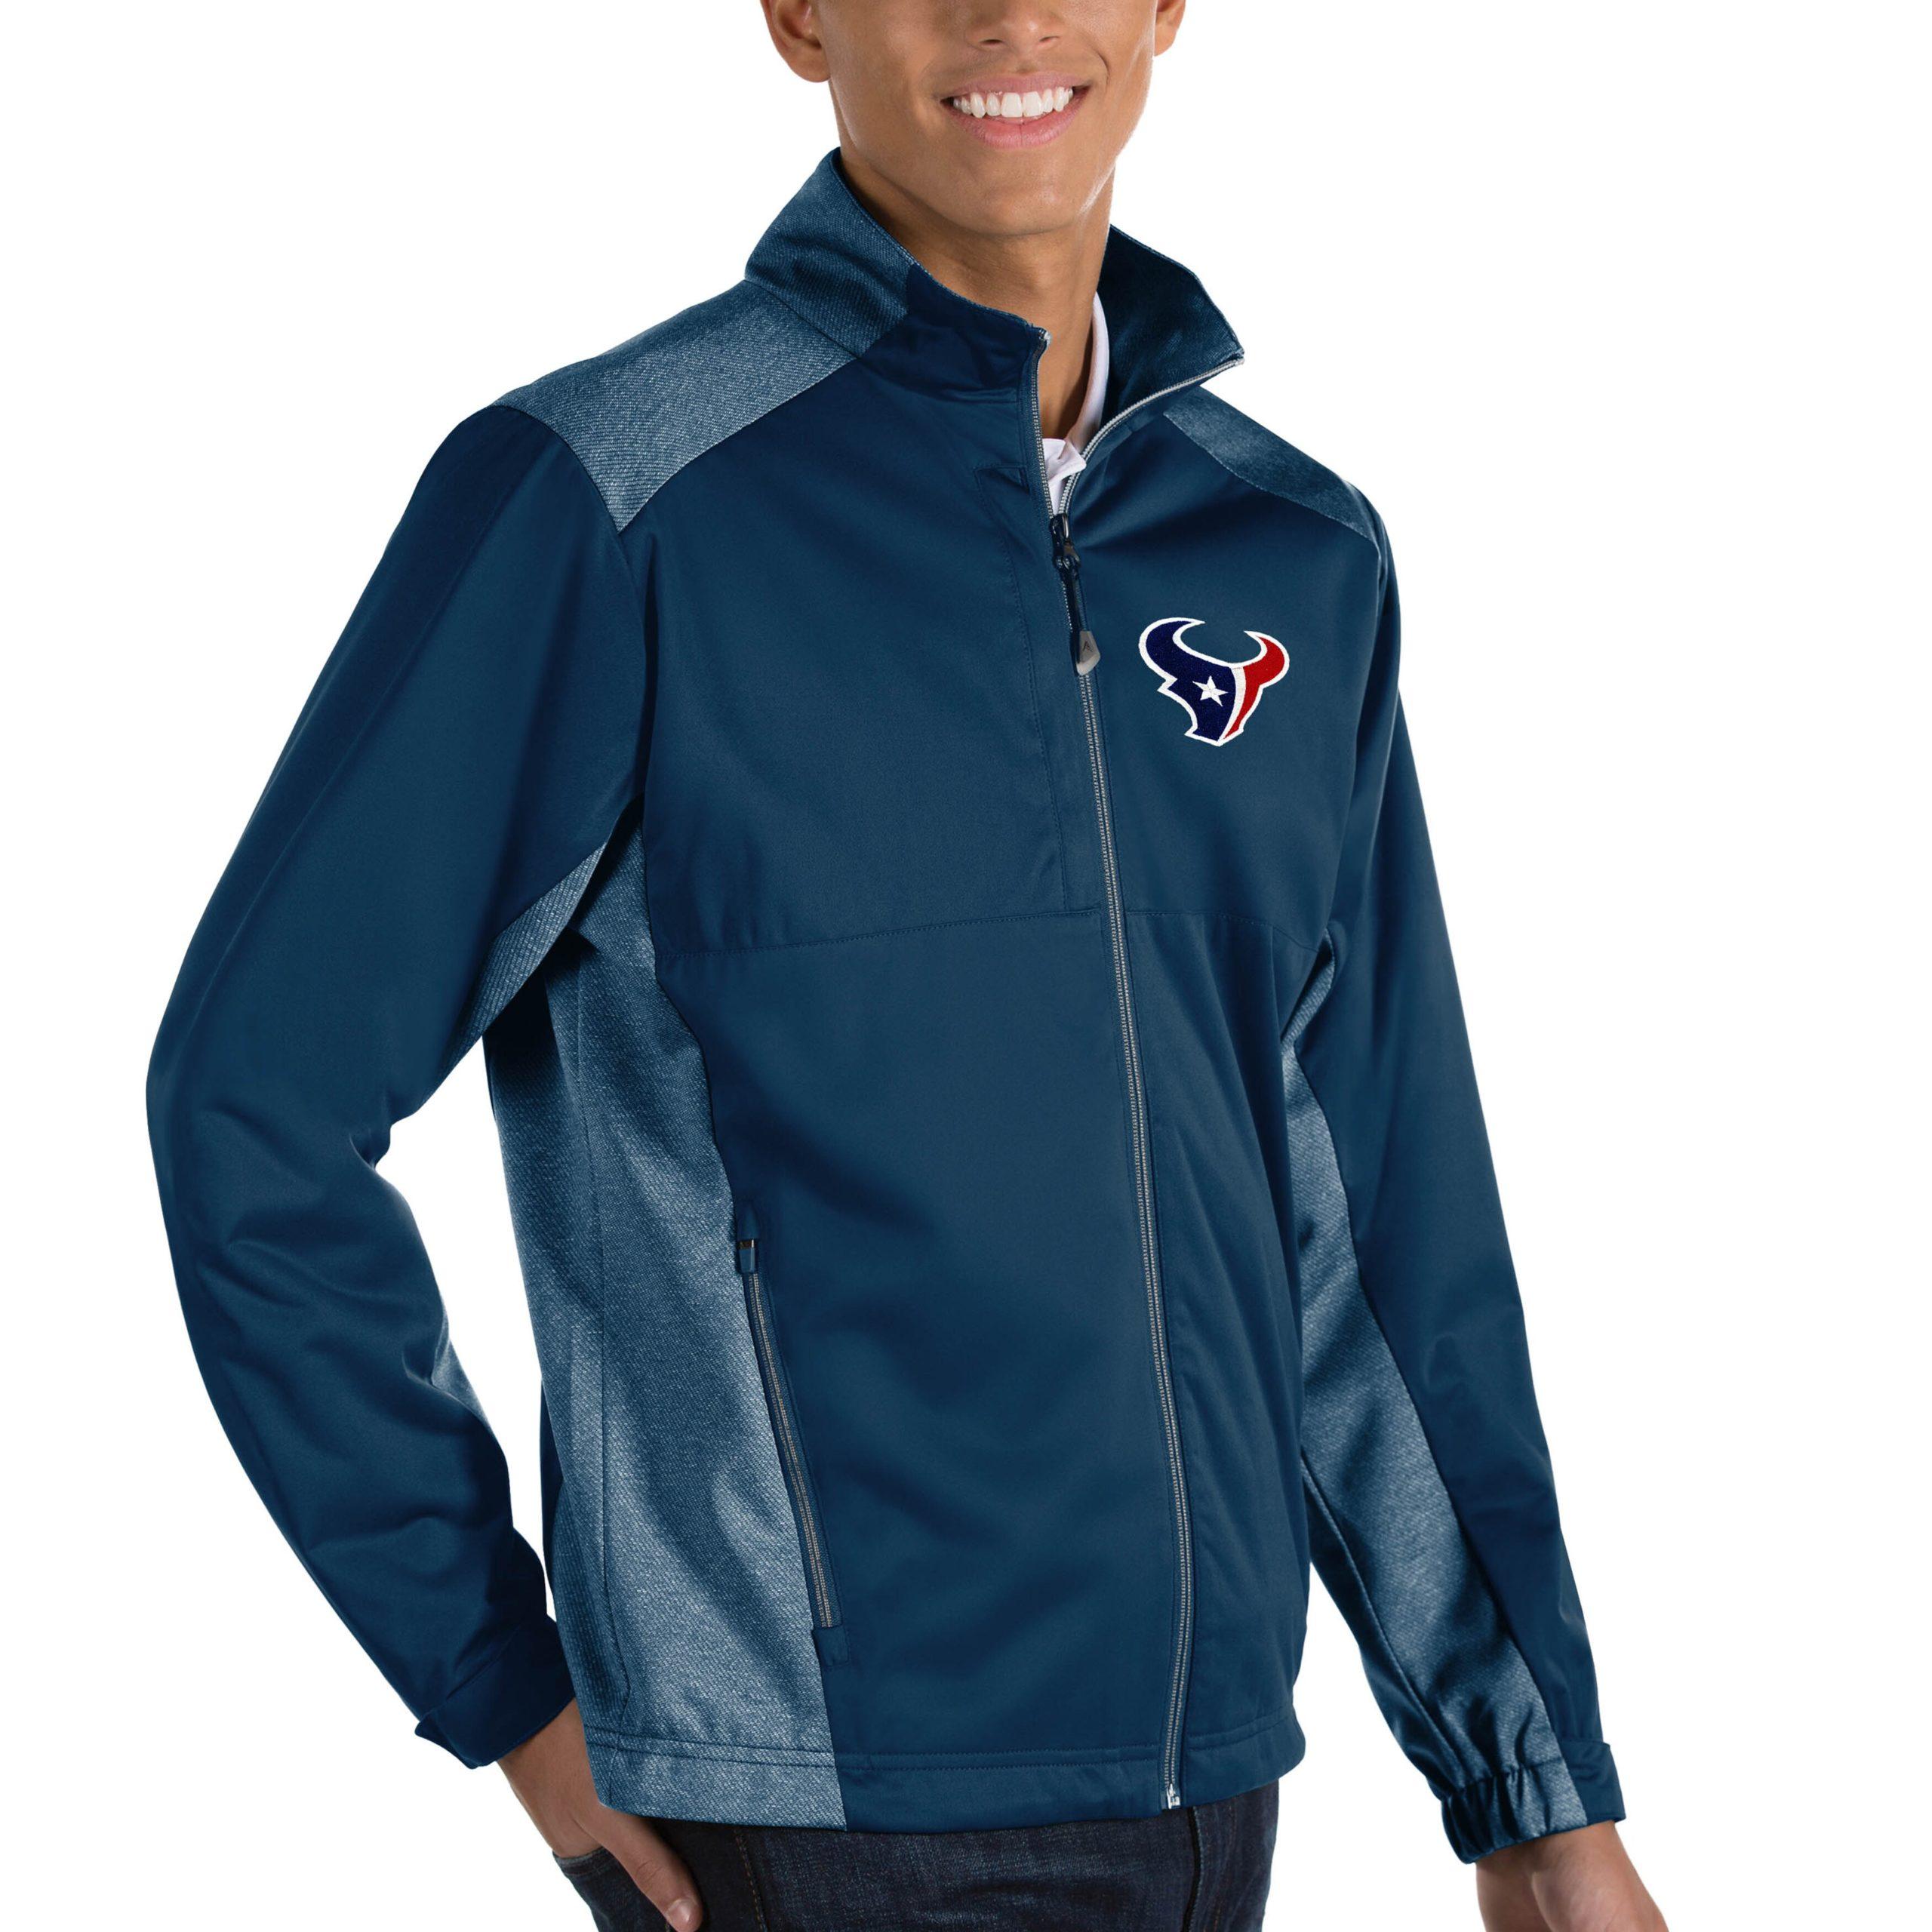 Houston Texans Antigua Revolve Big & Tall Full-Zip Jacket - Heather Navy